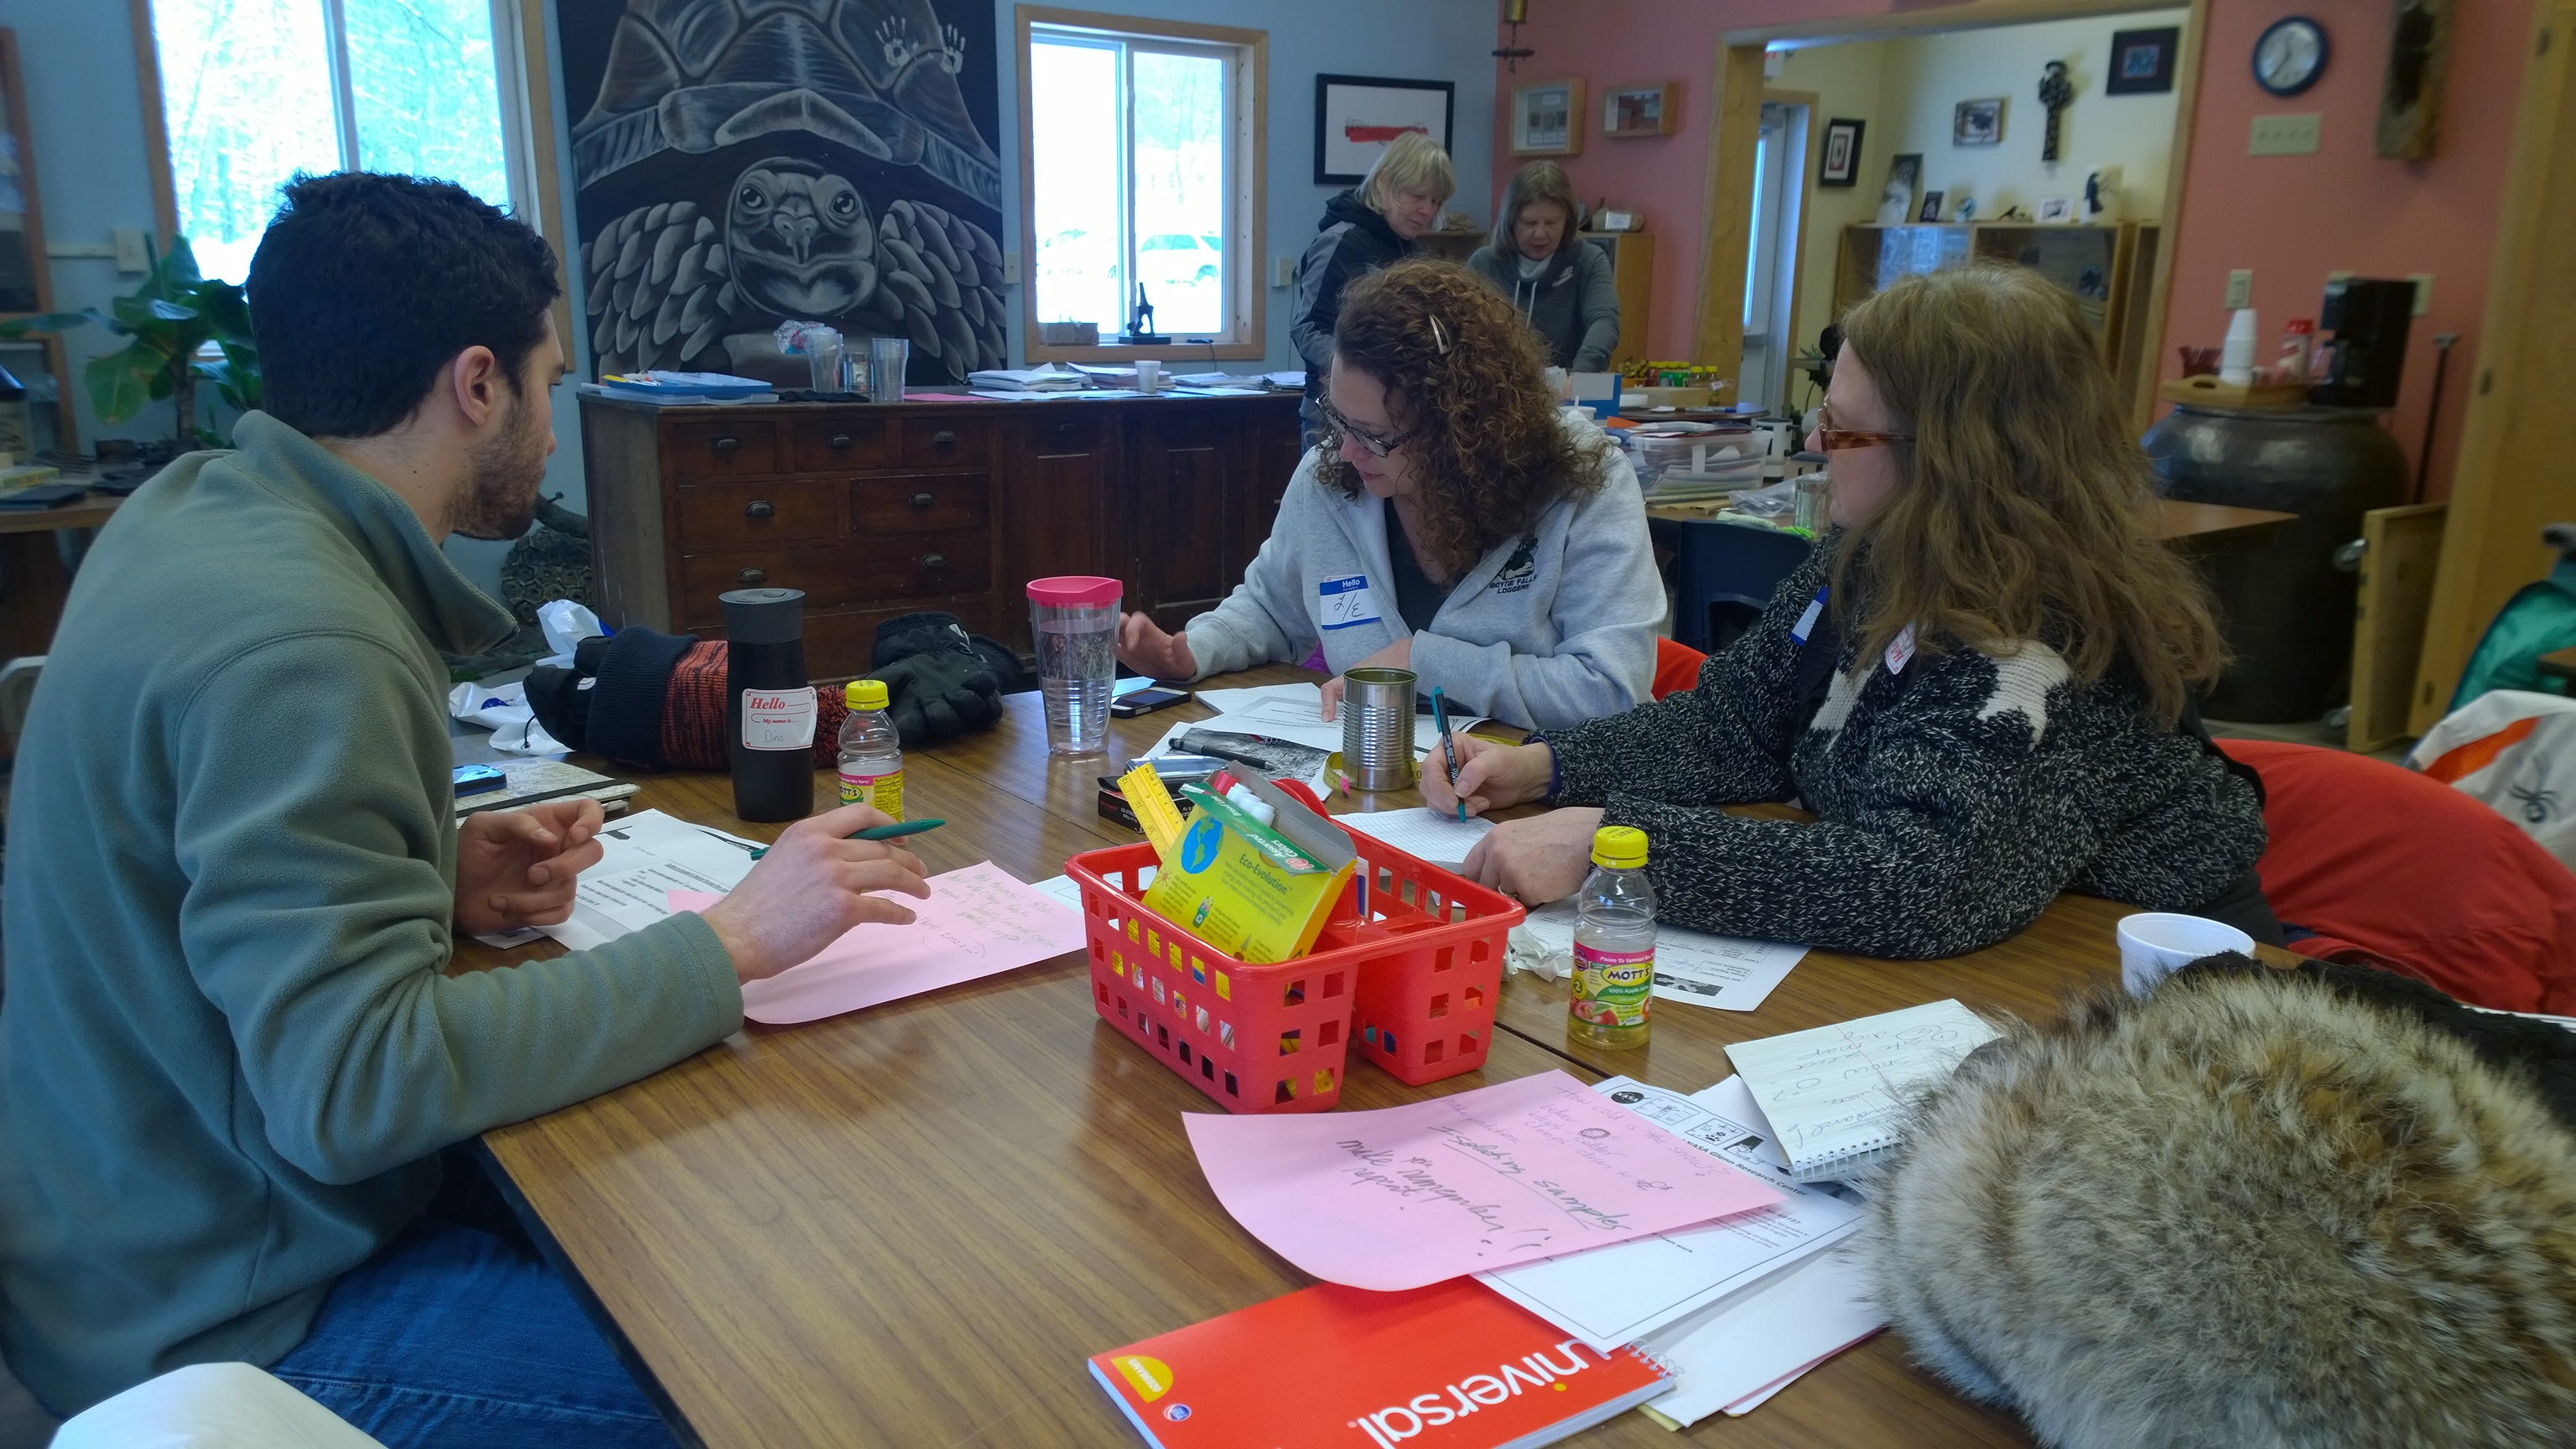 Two NASA workshops for educators